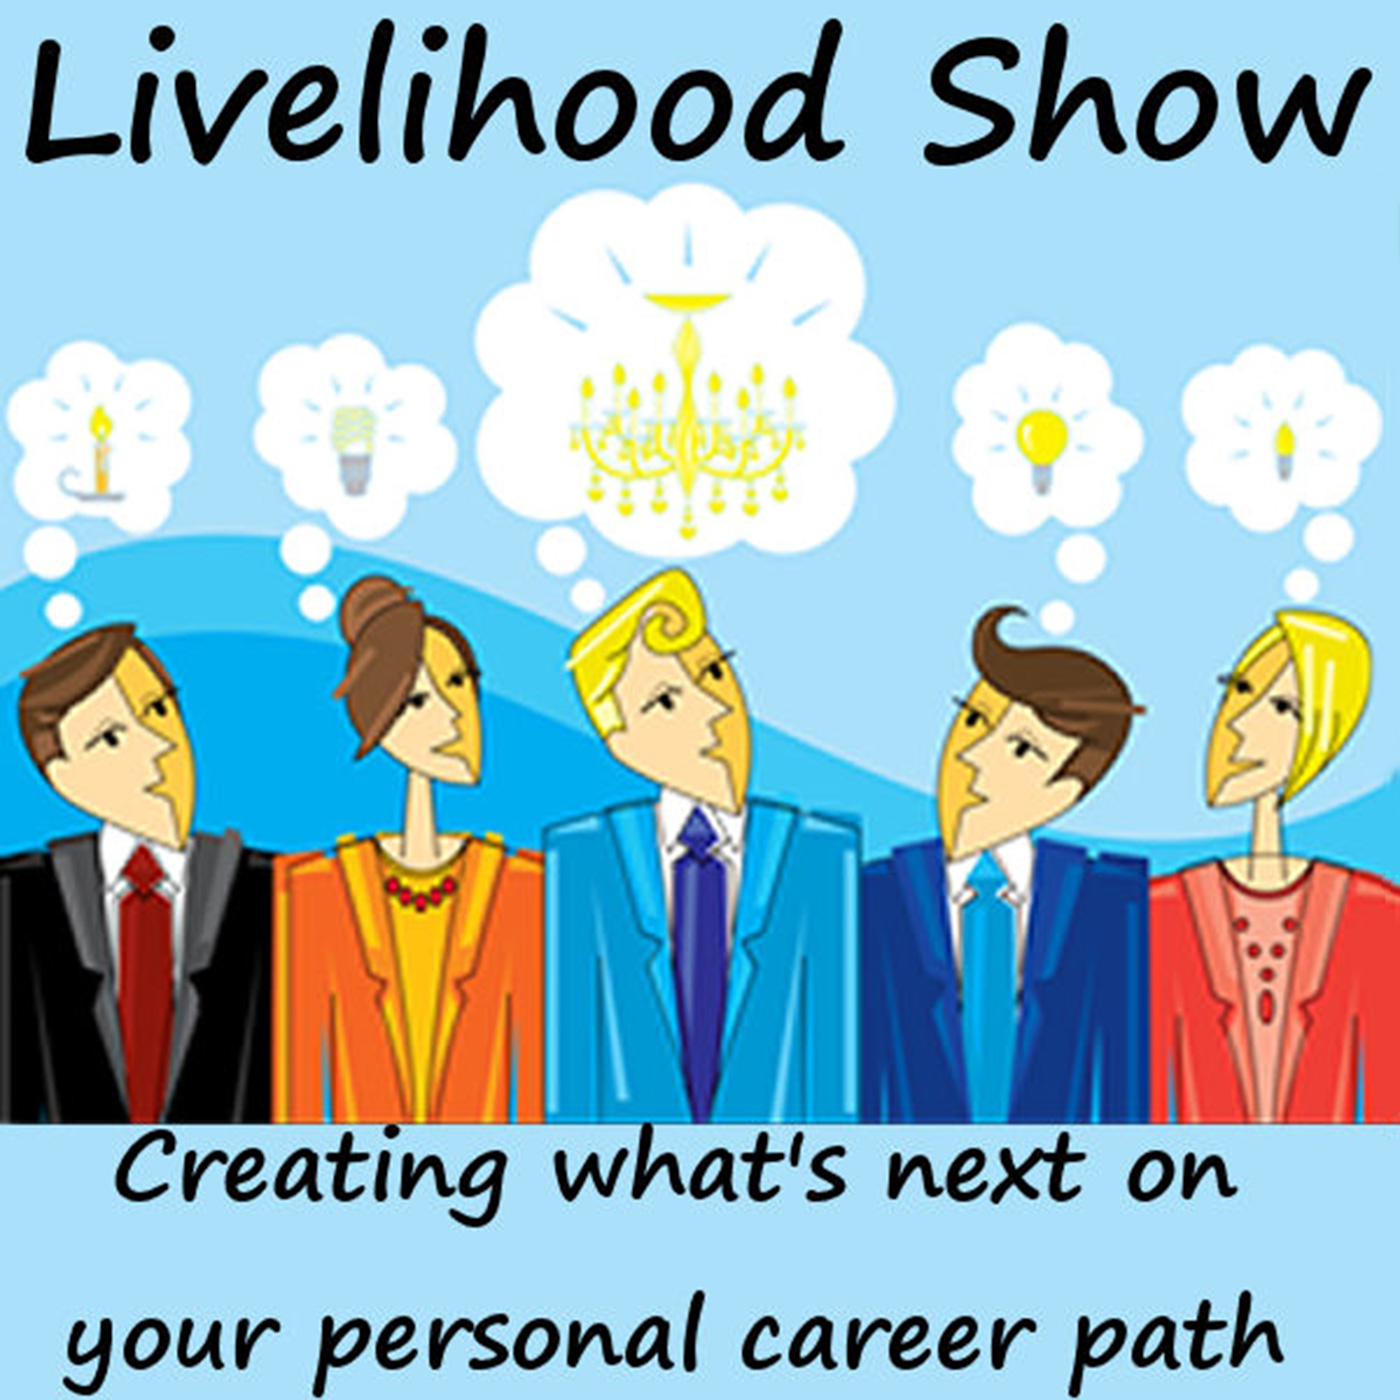 Livelihood Show show art